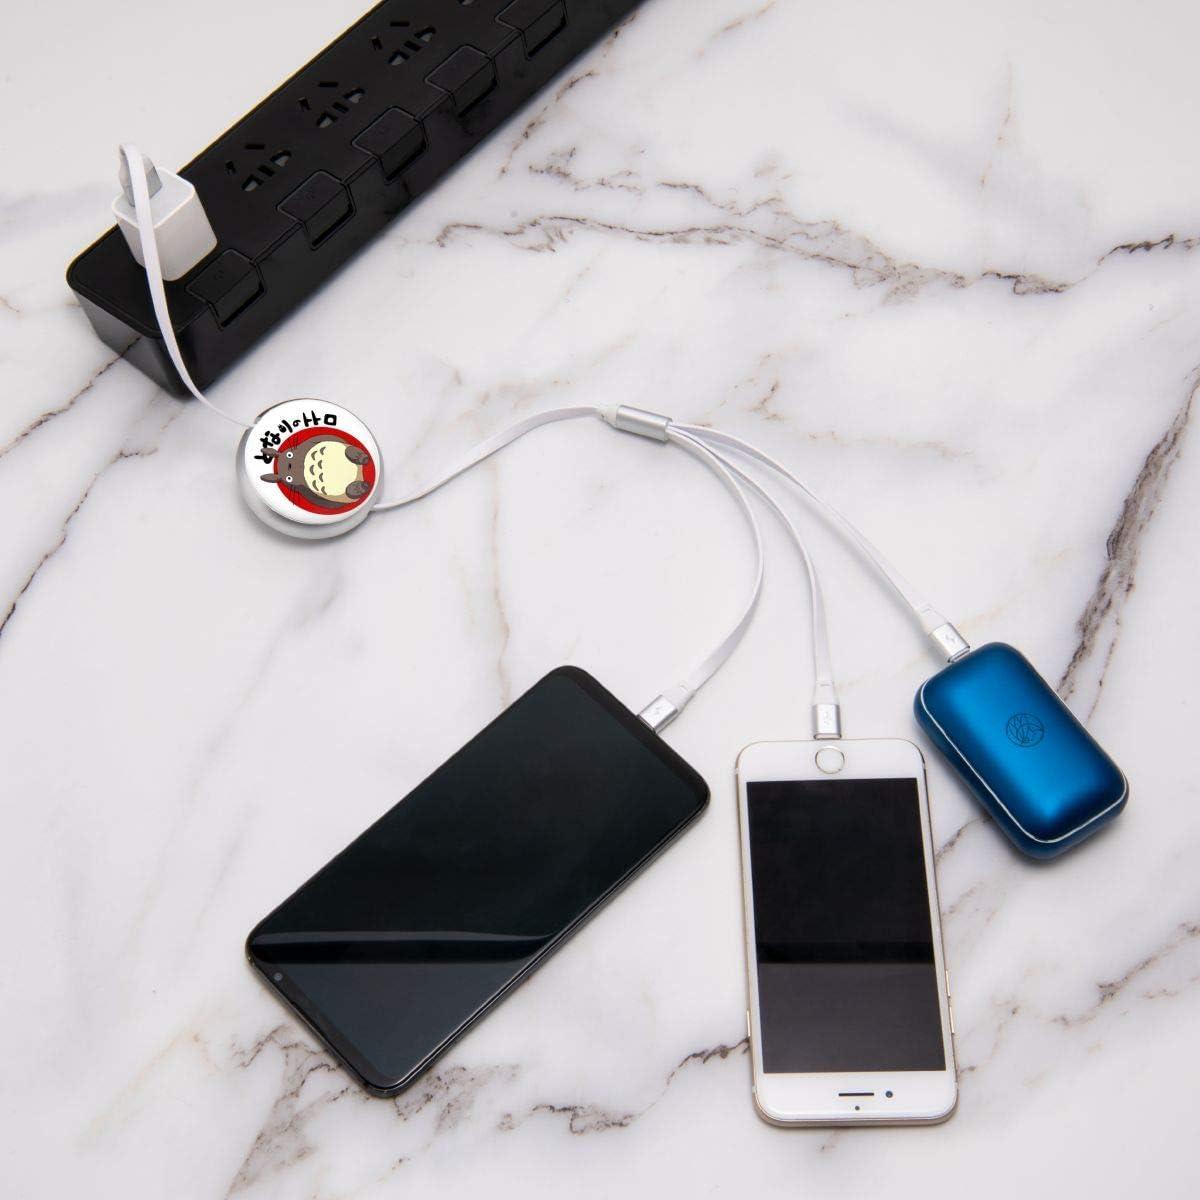 Gongczl Design Name Artdesign Namefashion USB Cable Suitable for Family